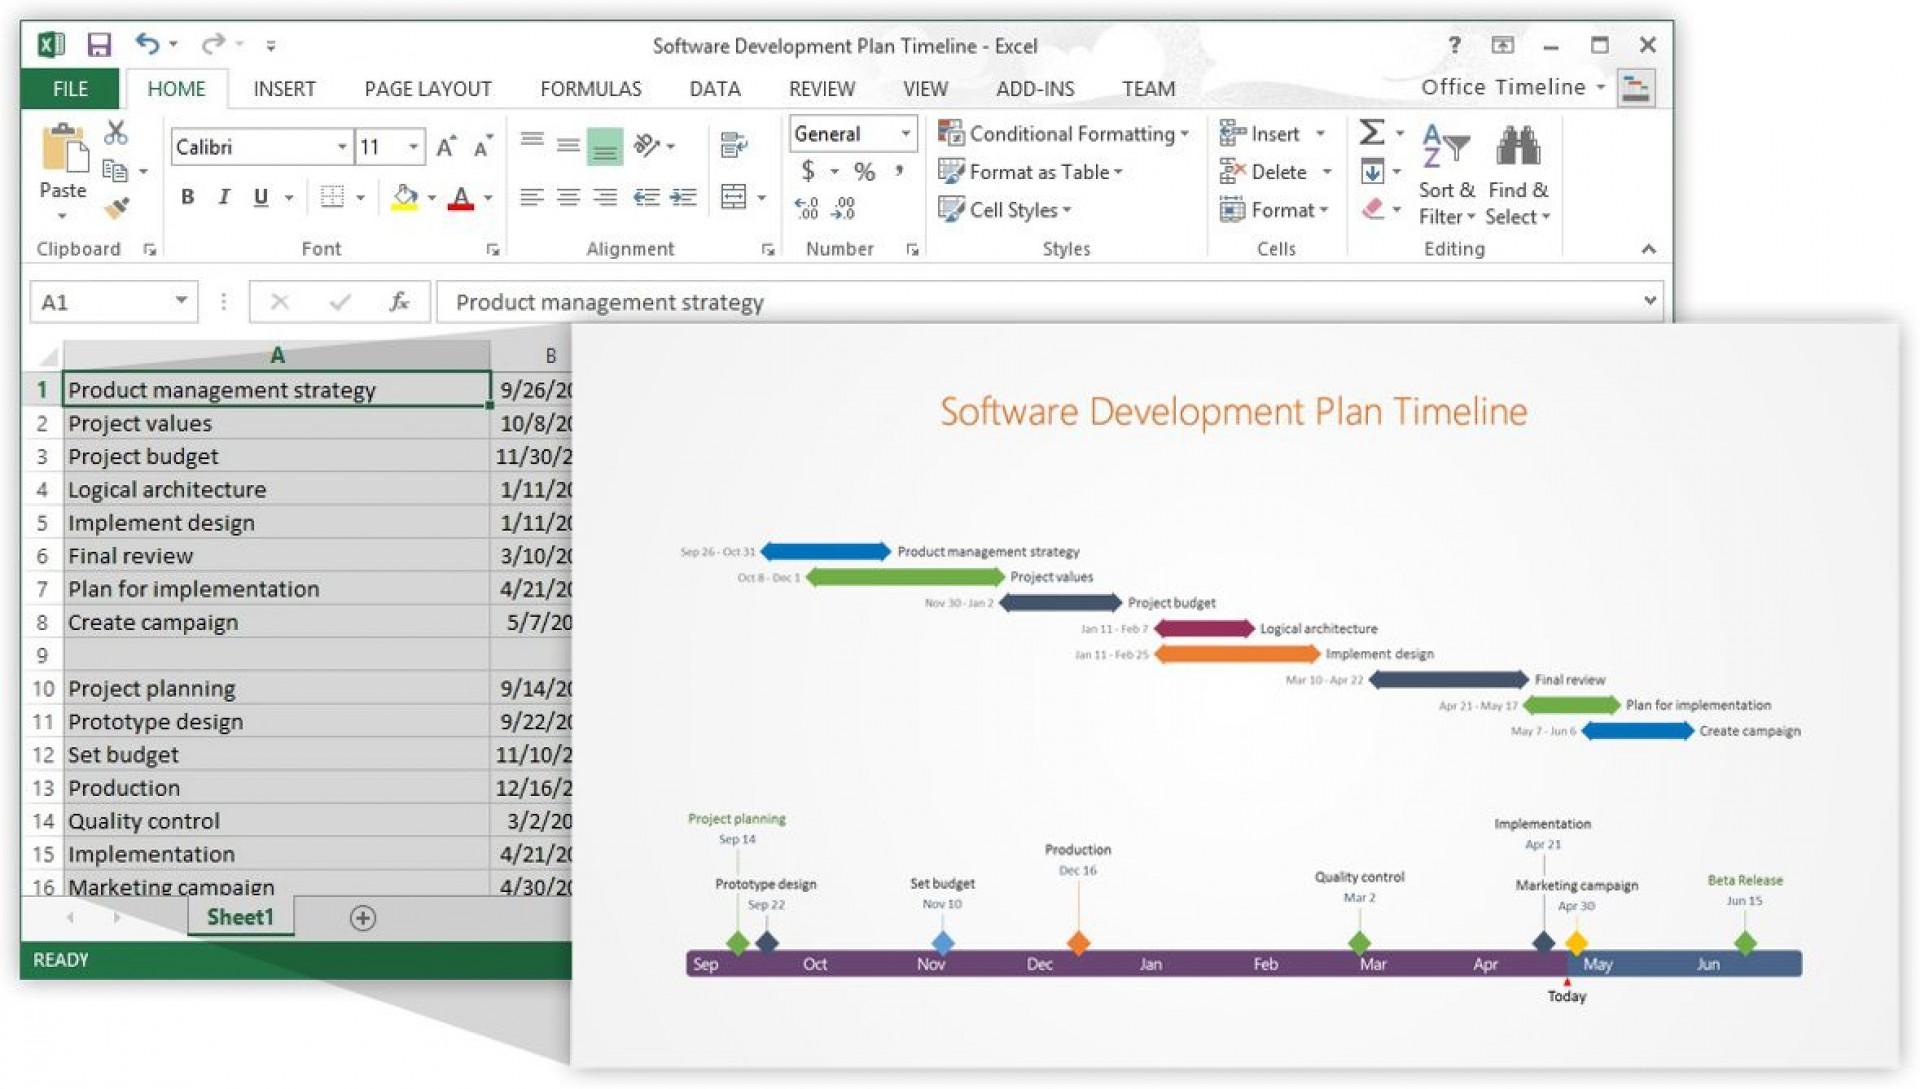 007 Unique Excel Project Timeline Template Example  2020 Xl Tutorial1920